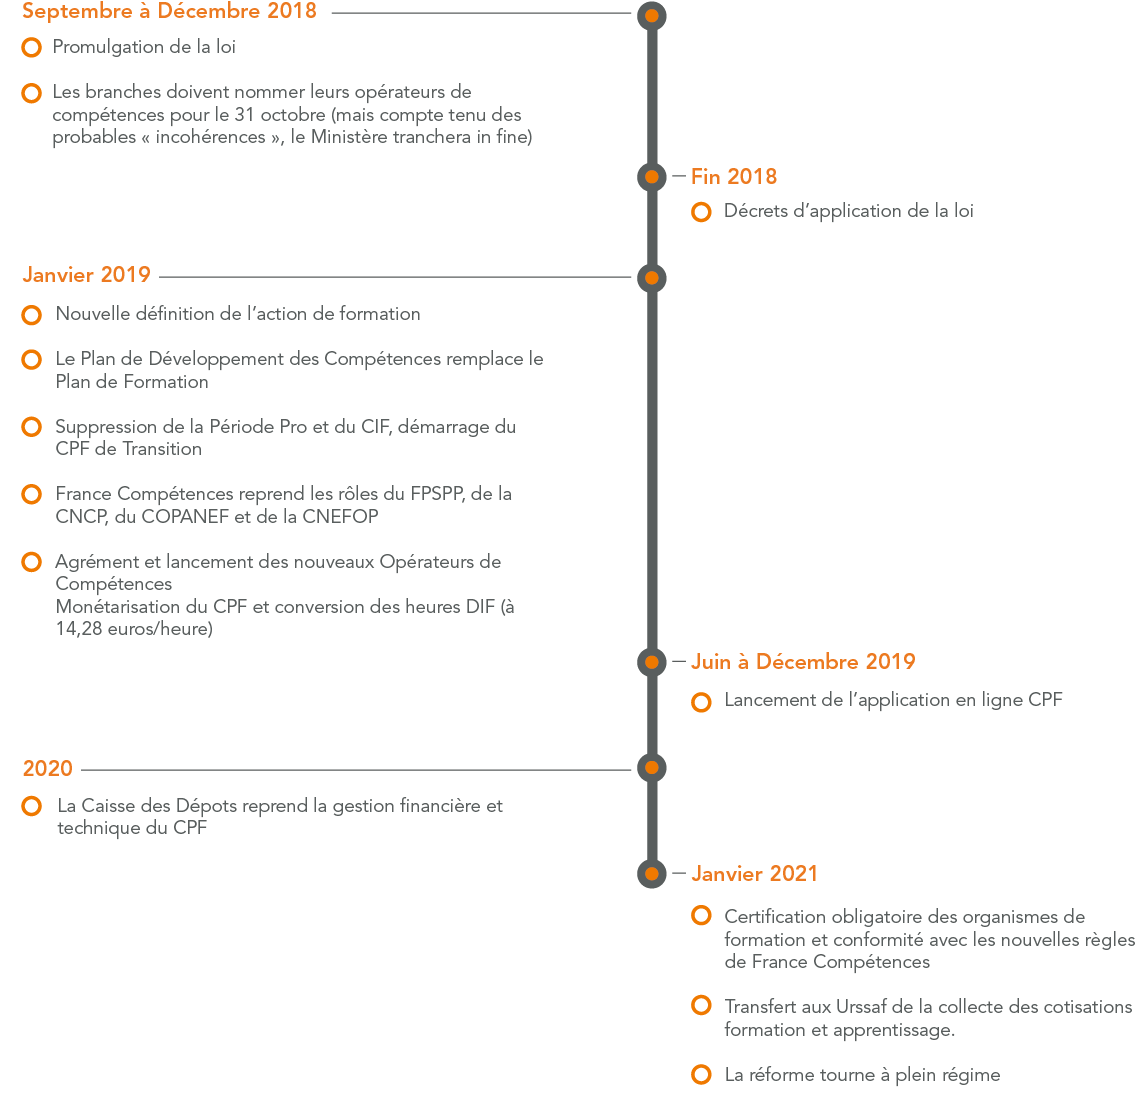 Calendrier réforme formation